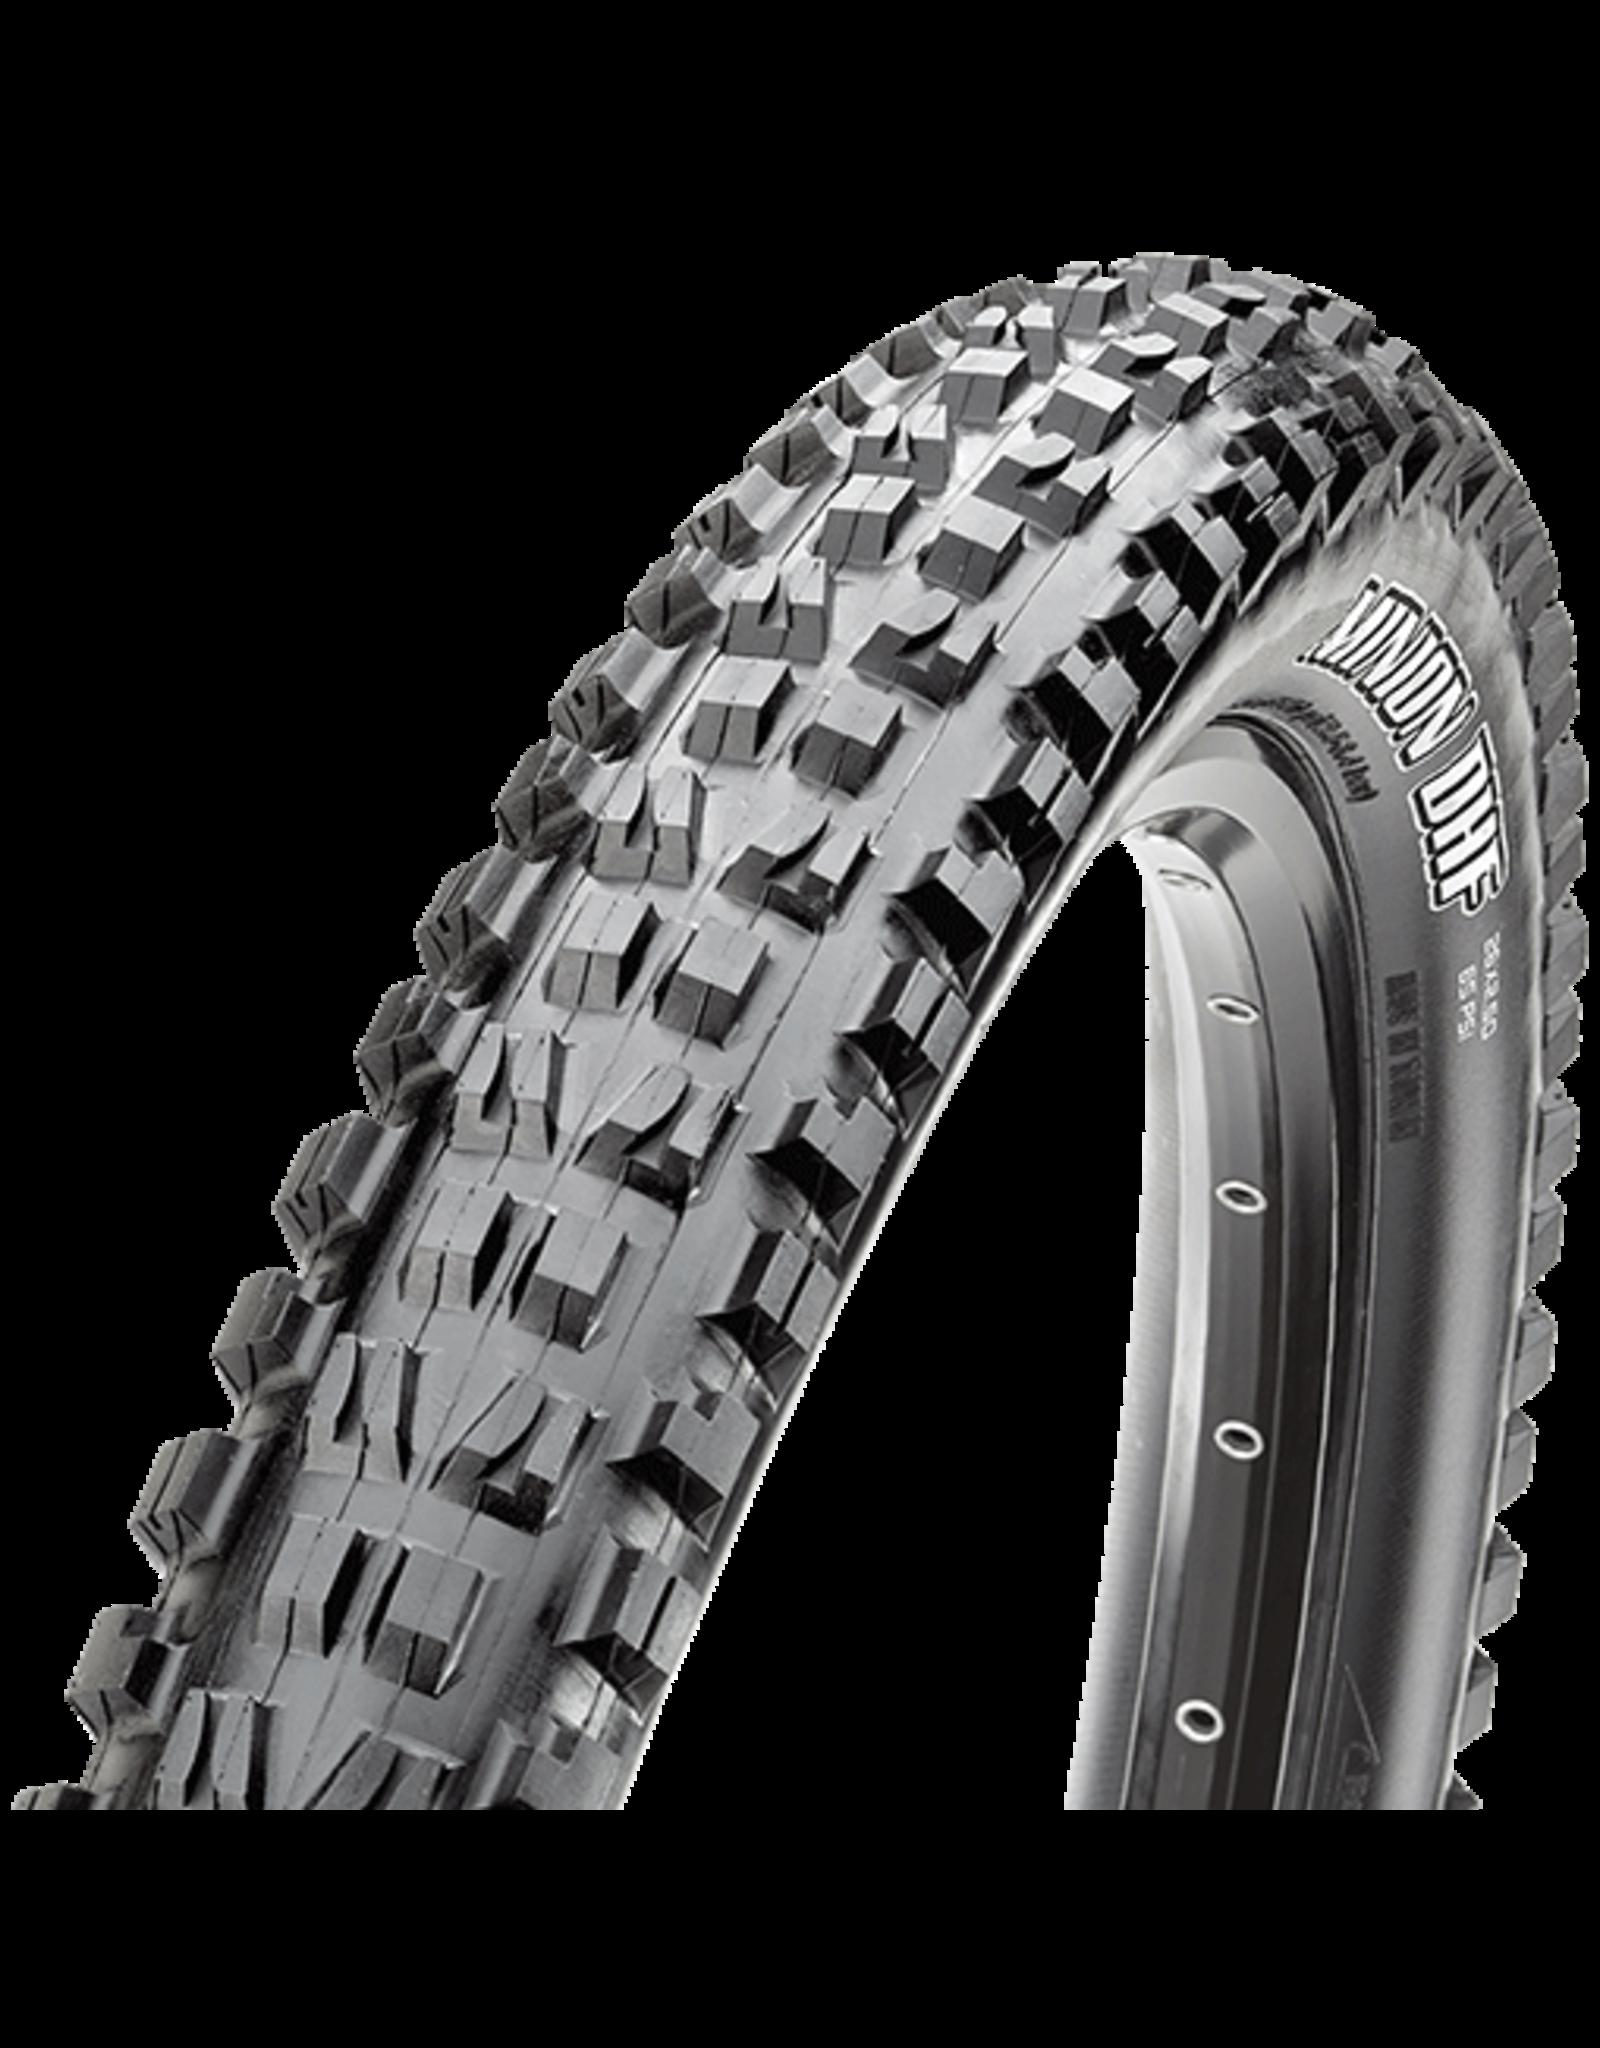 Maxxis Minion DHF Tire - 29 x 2.5, Folding, Tubeless, Black, Dual, EXO, Wide Trail